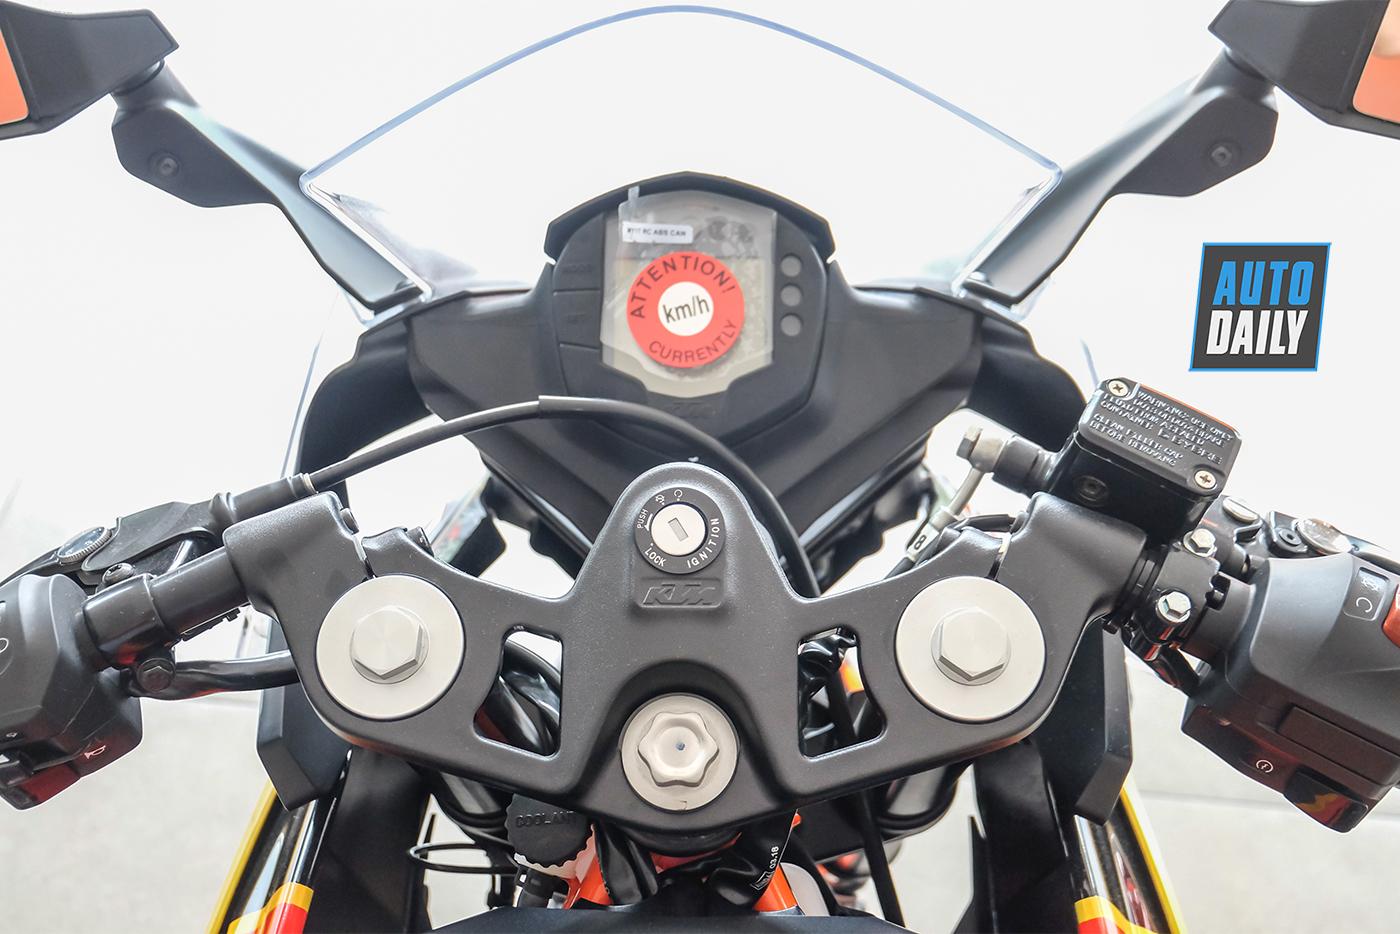 ktm-rc-390-motogp-edition-27.jpg